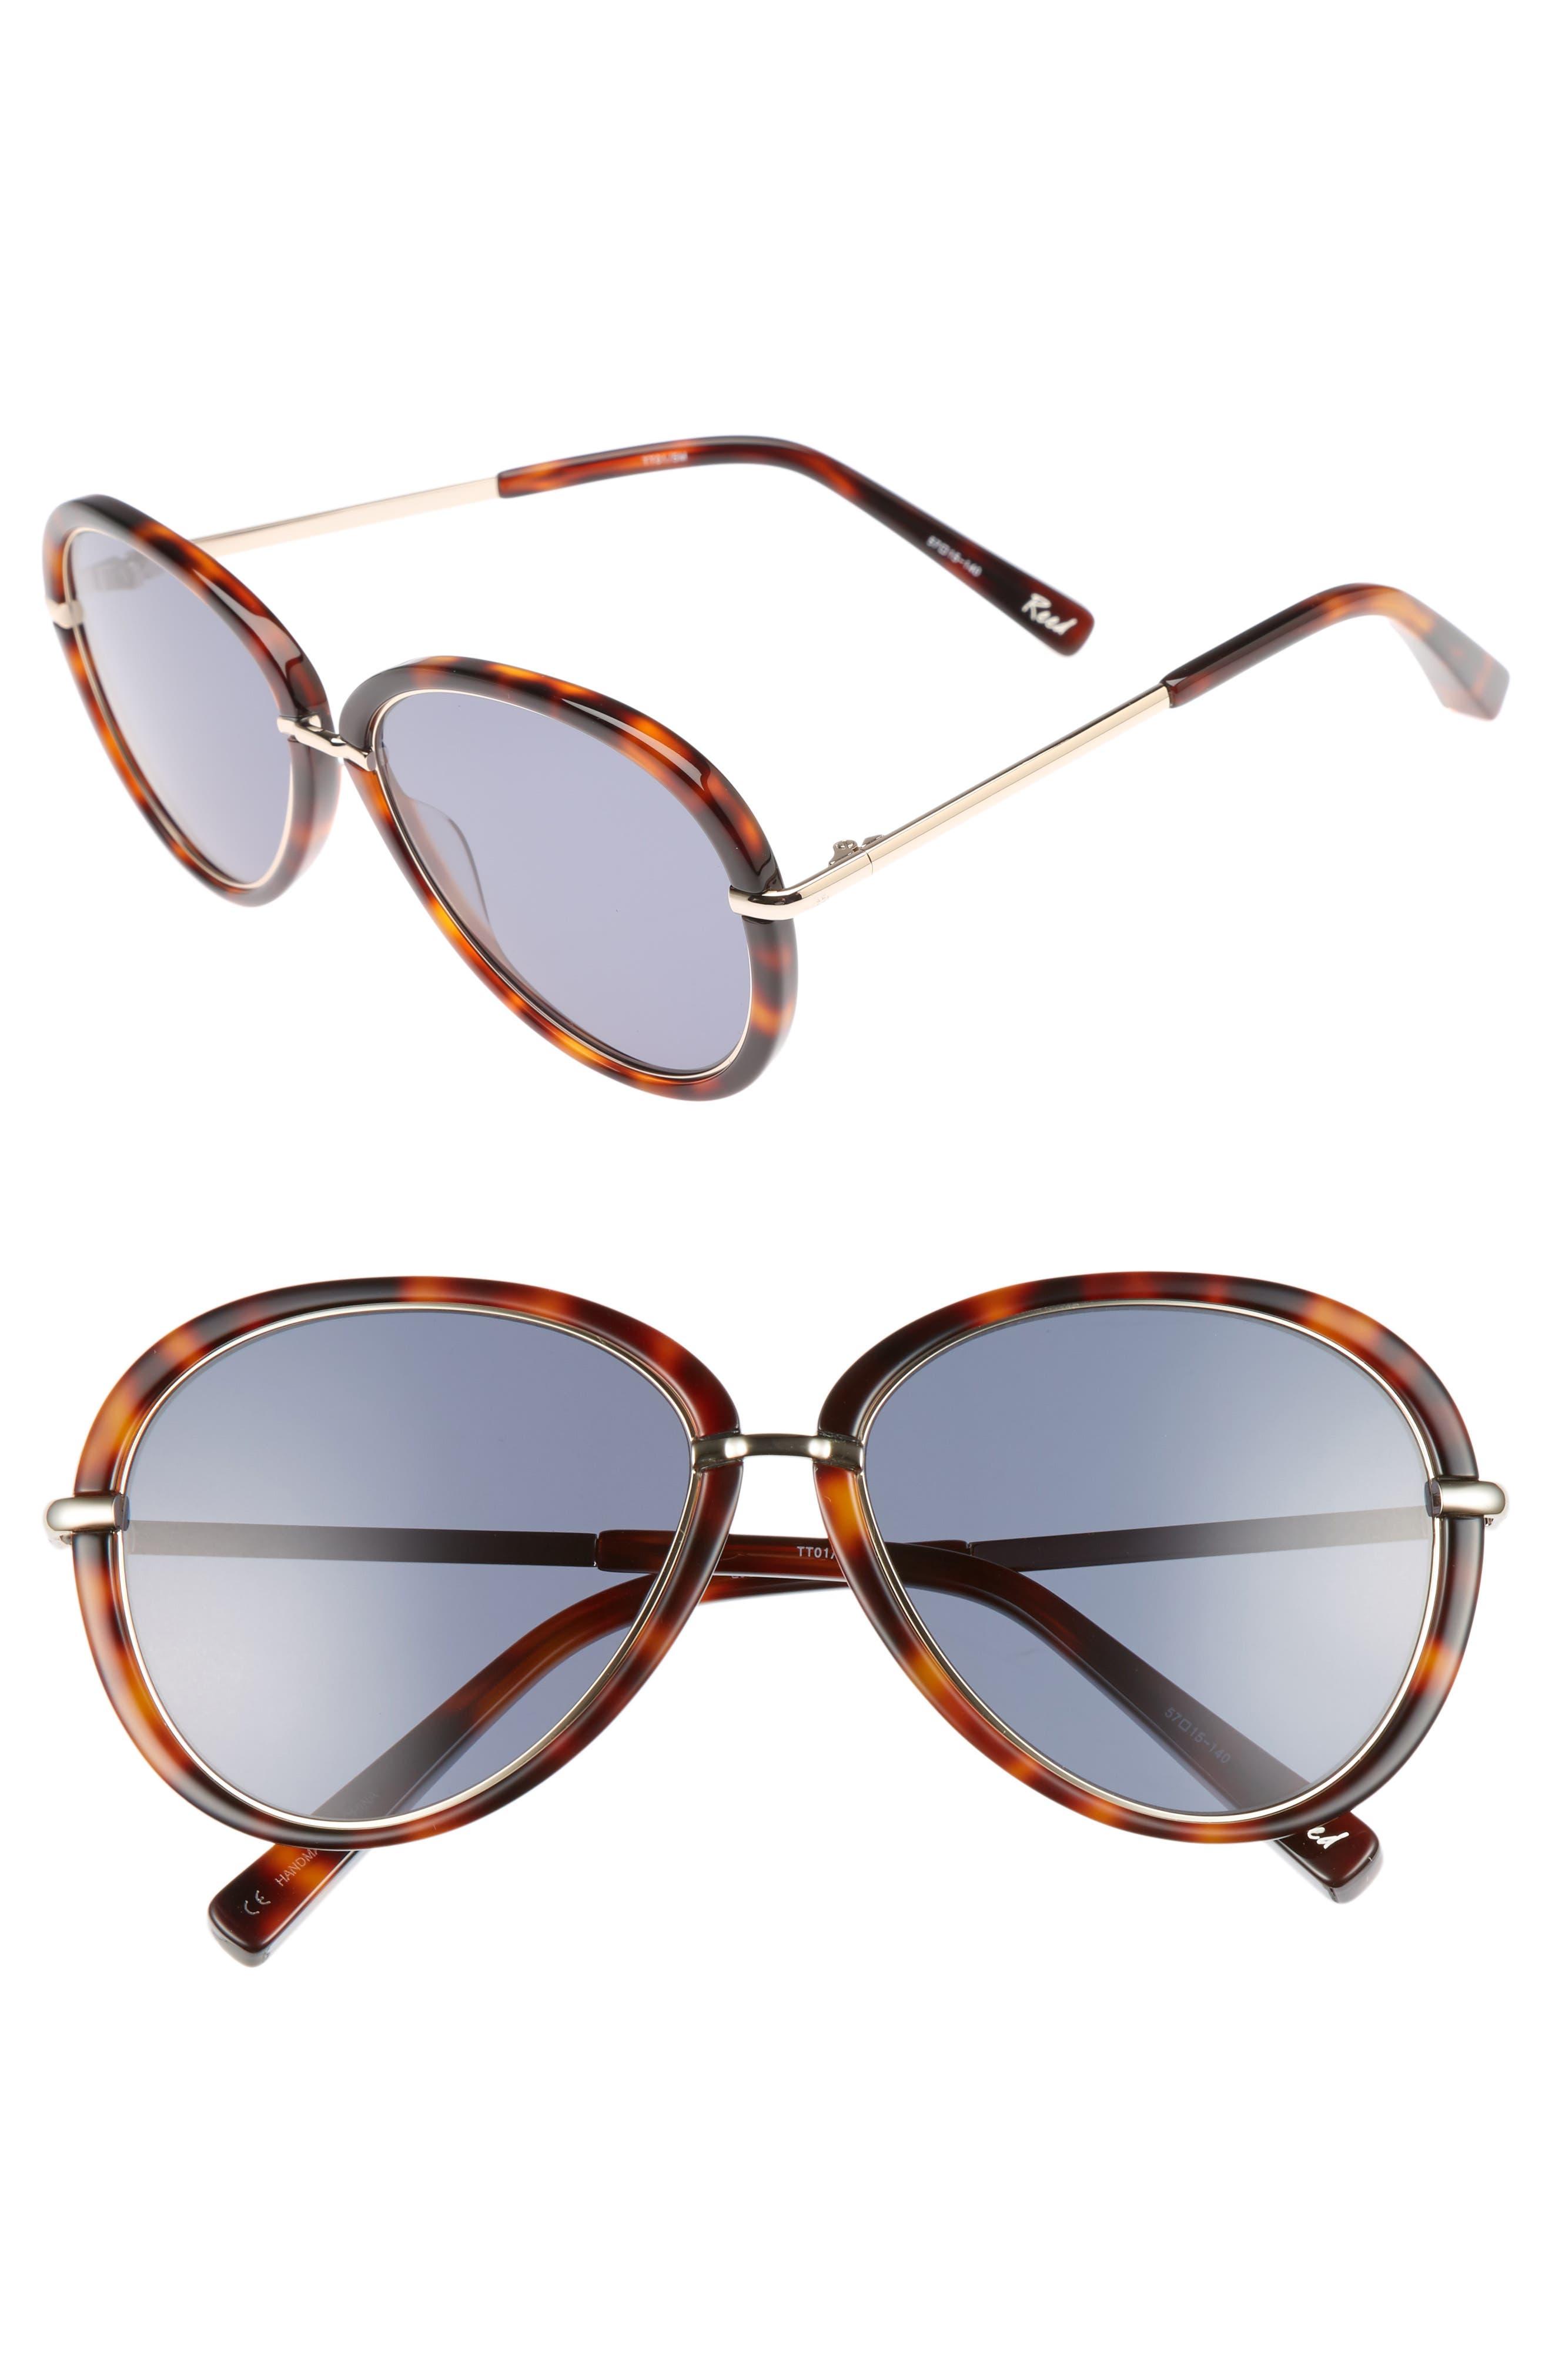 Reed 57mm Aviator Sunglasses,                         Main,                         color, Tortoise